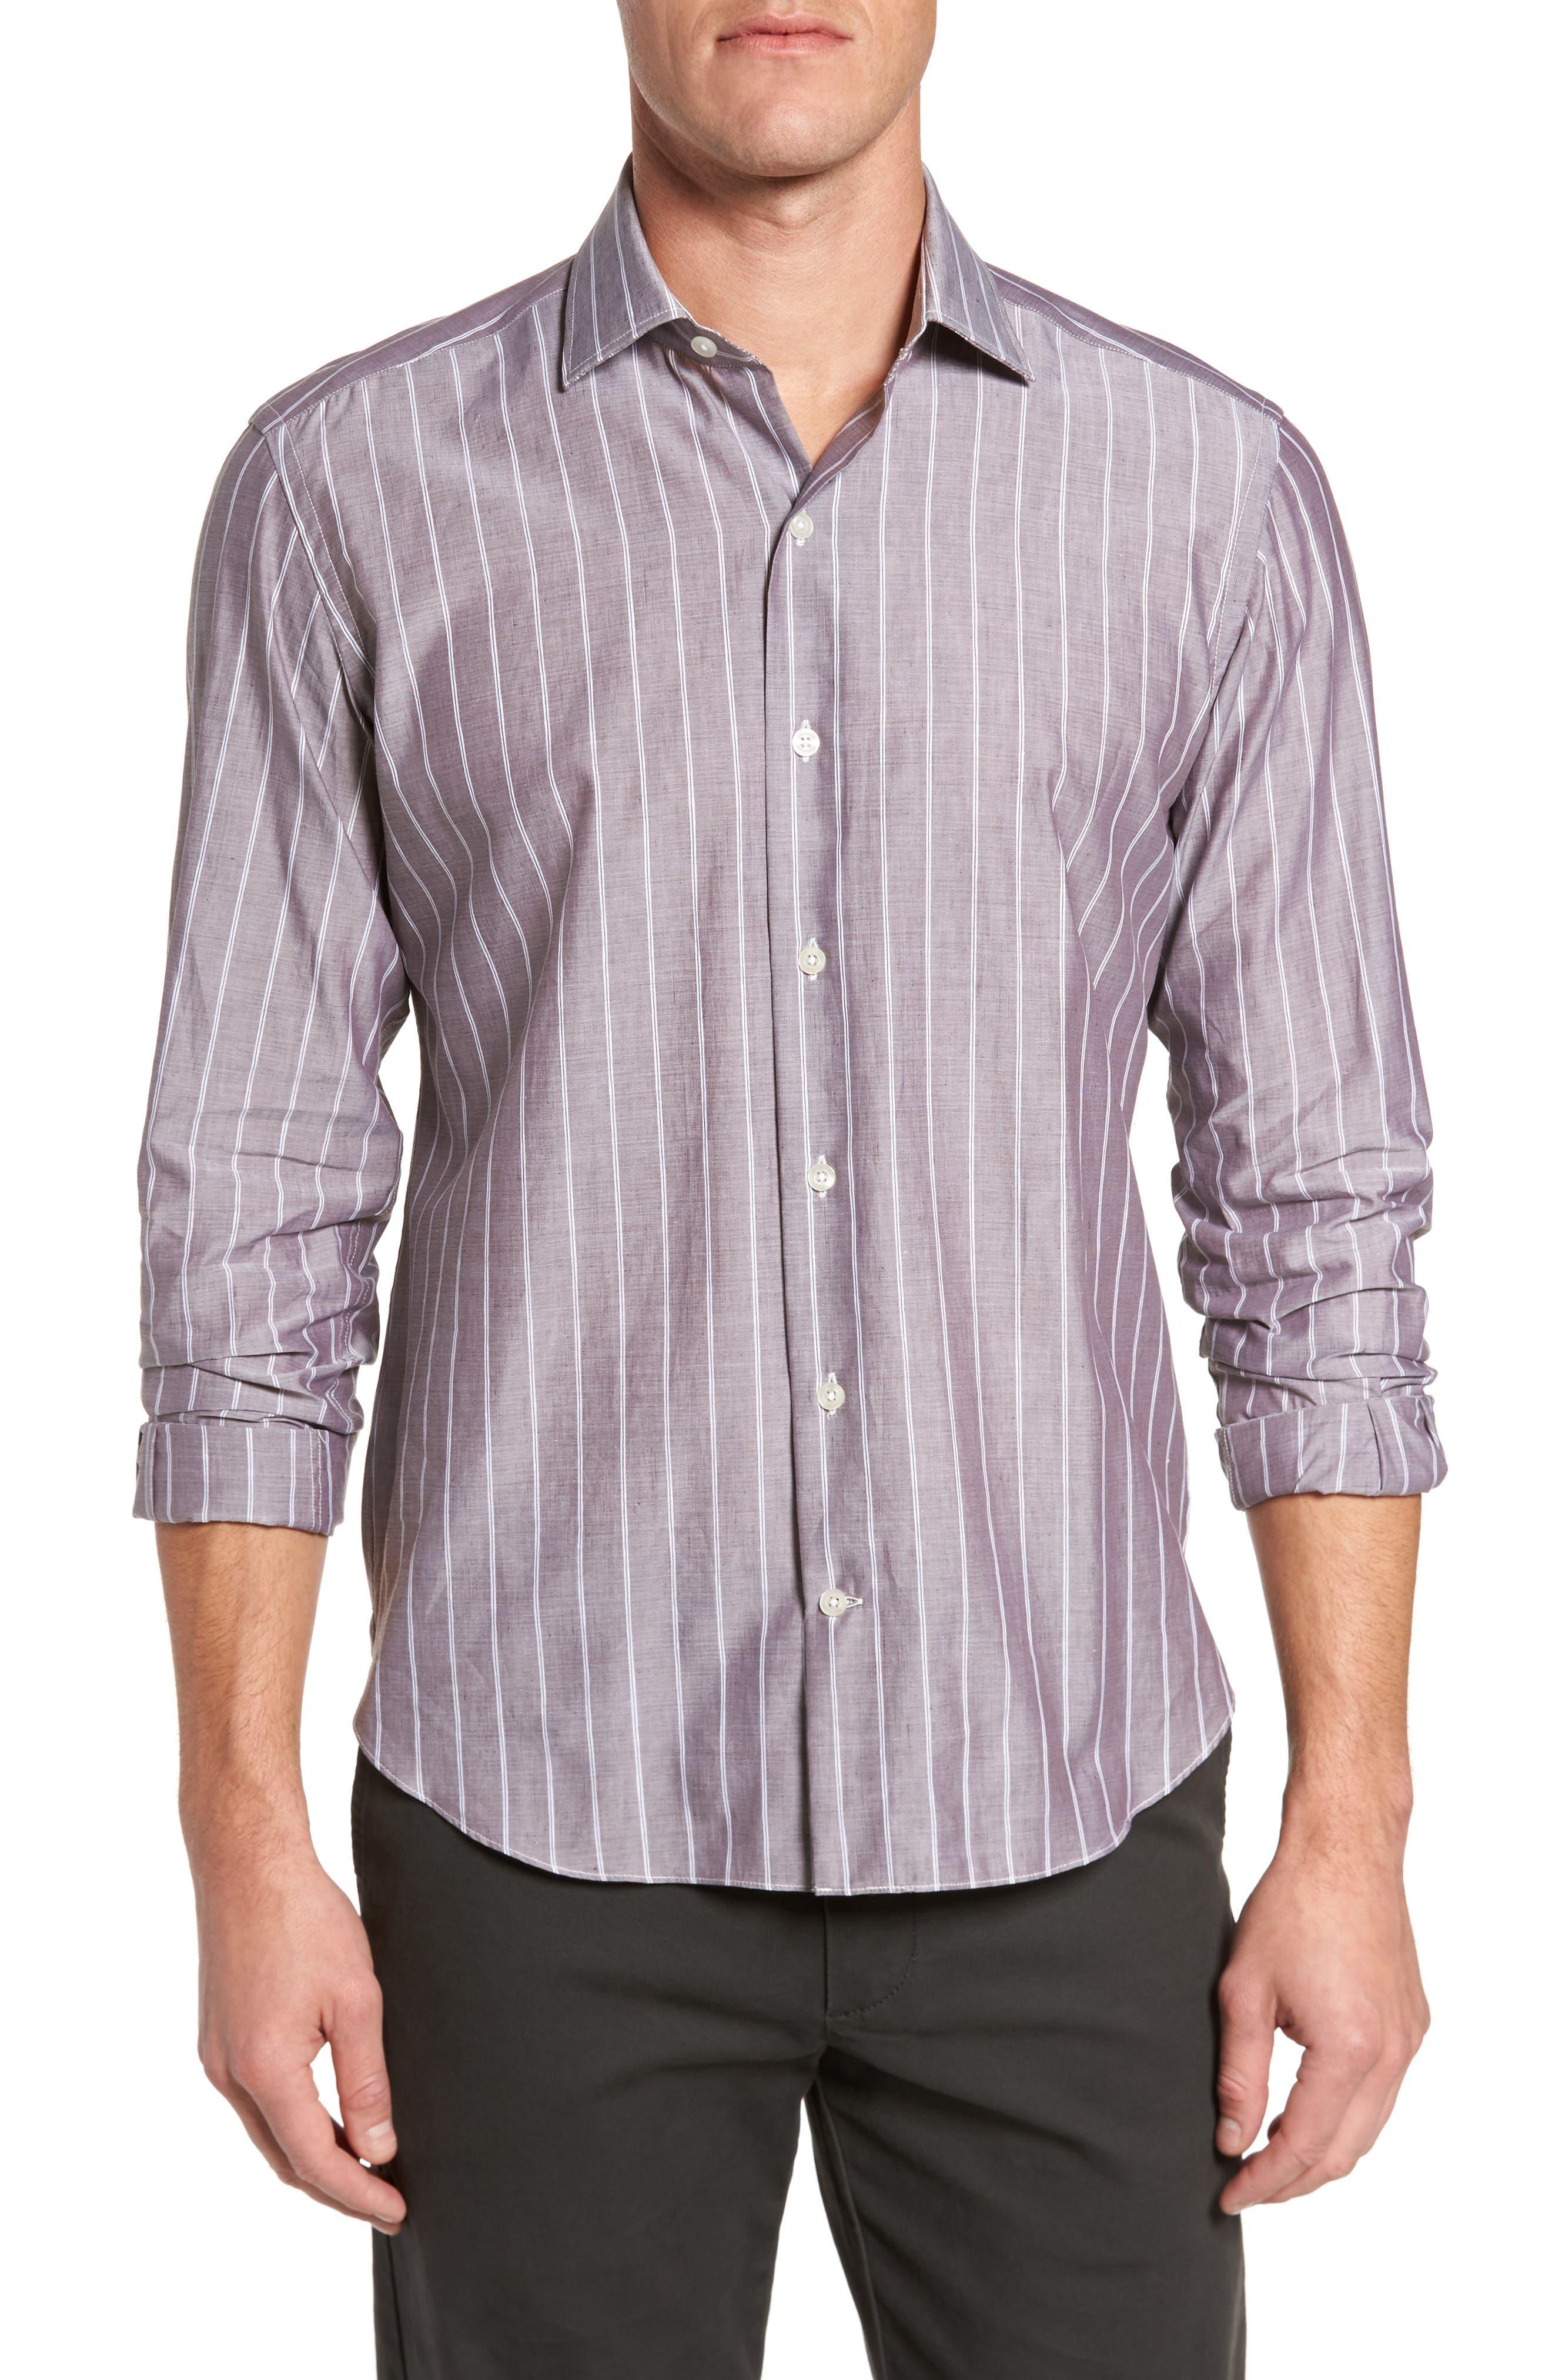 Culturata Barr Slim Fit Stripe Sport Shirt